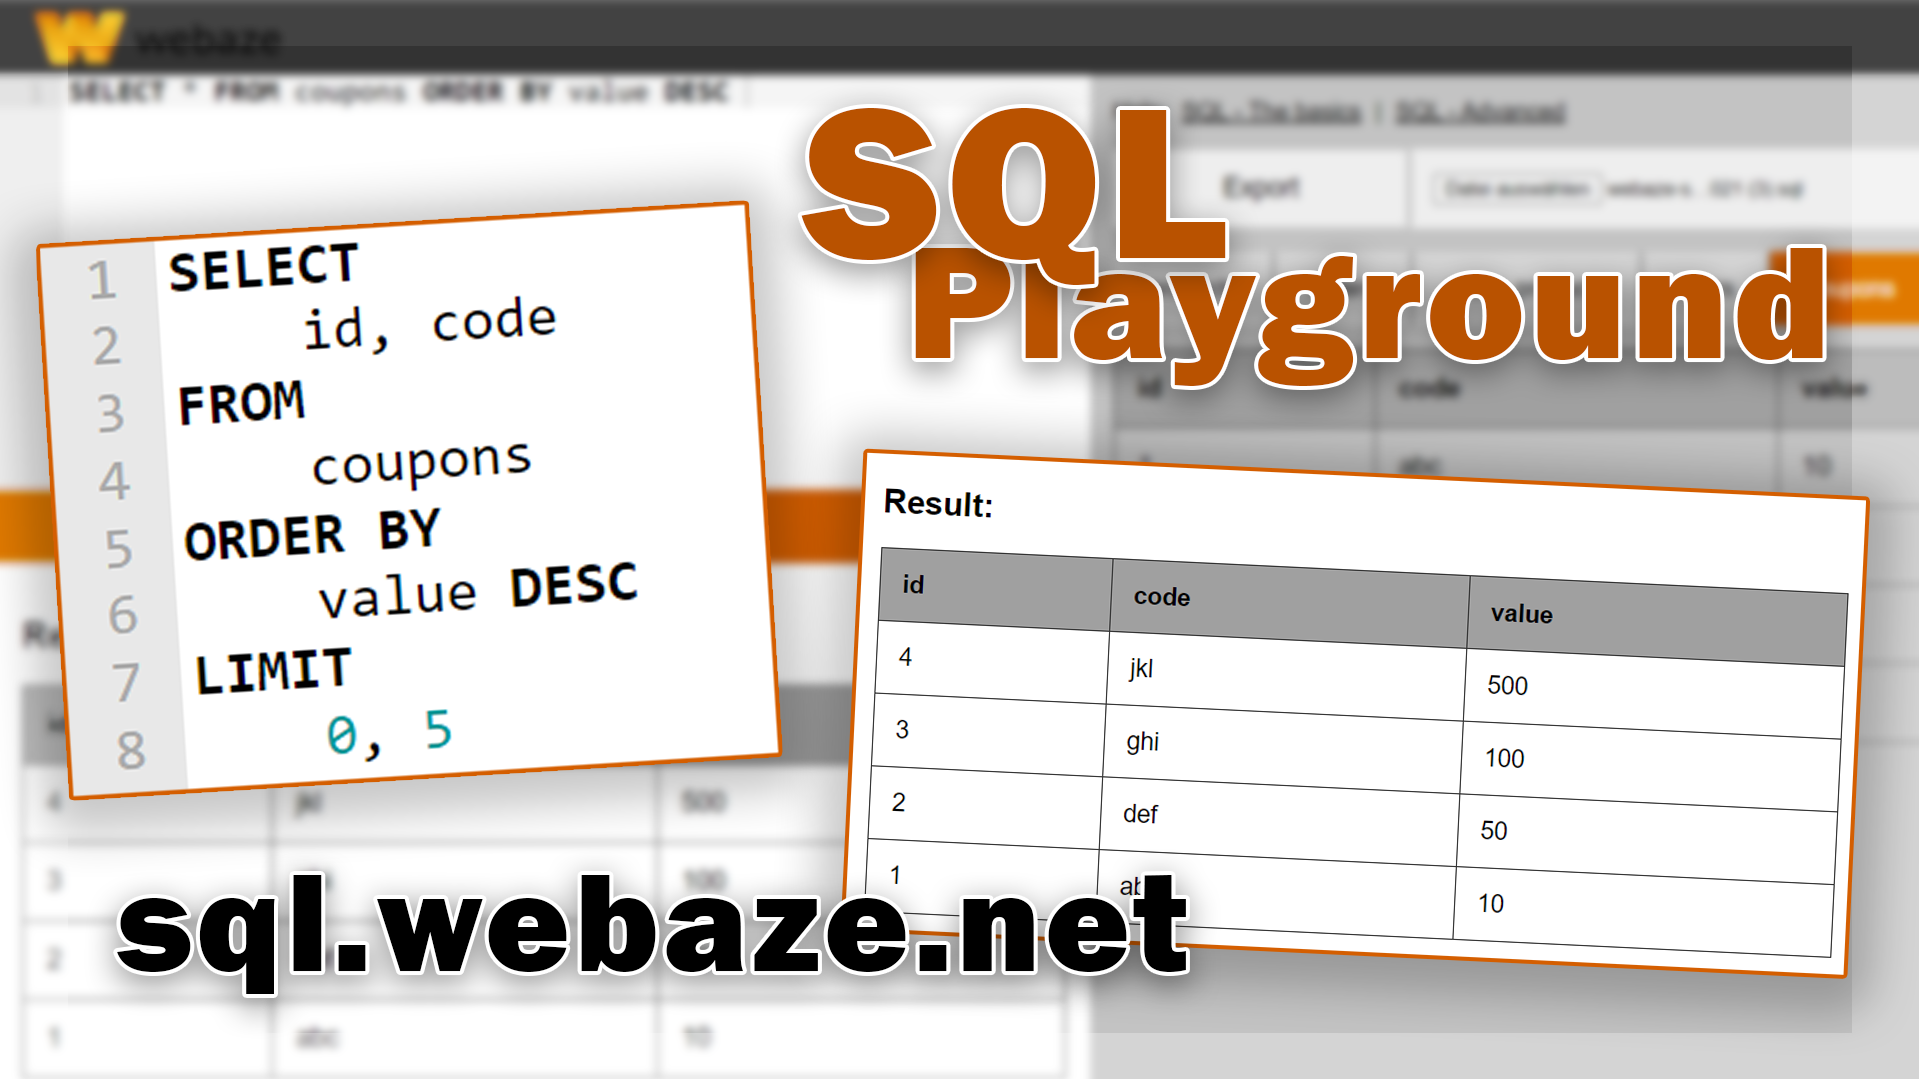 SQL Playground on webaze.net